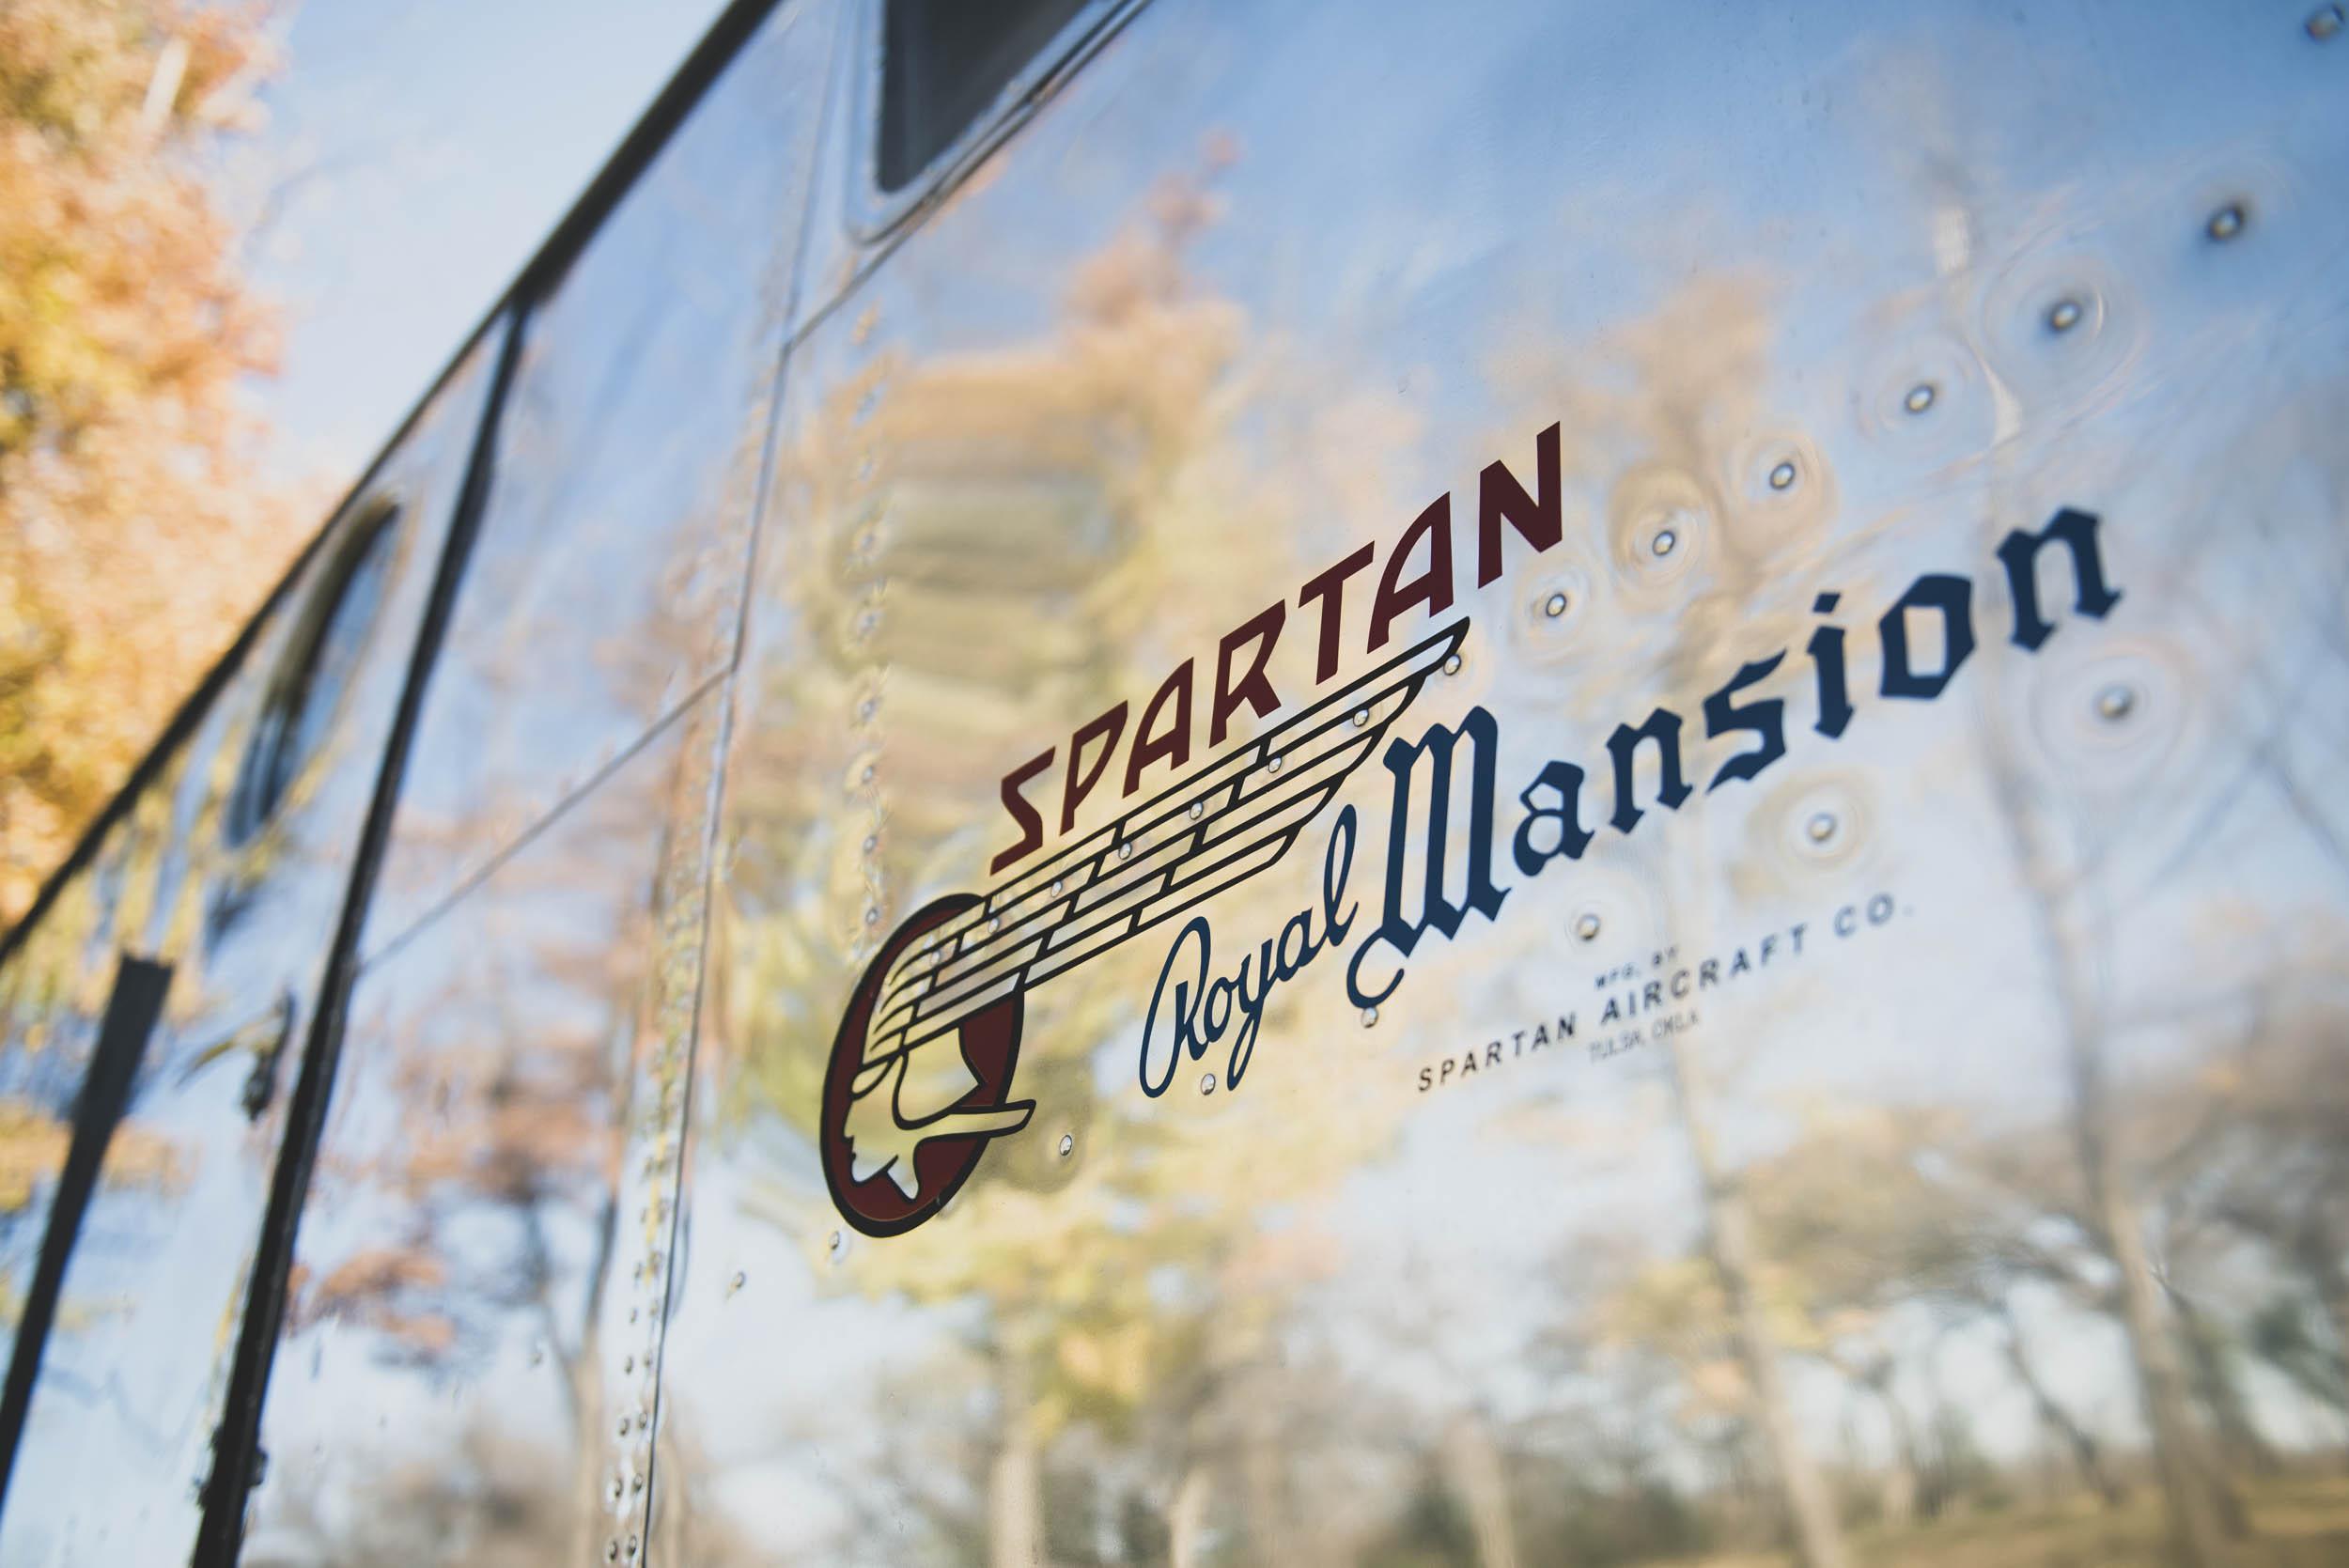 1951 Spartan Royal Mansion logo